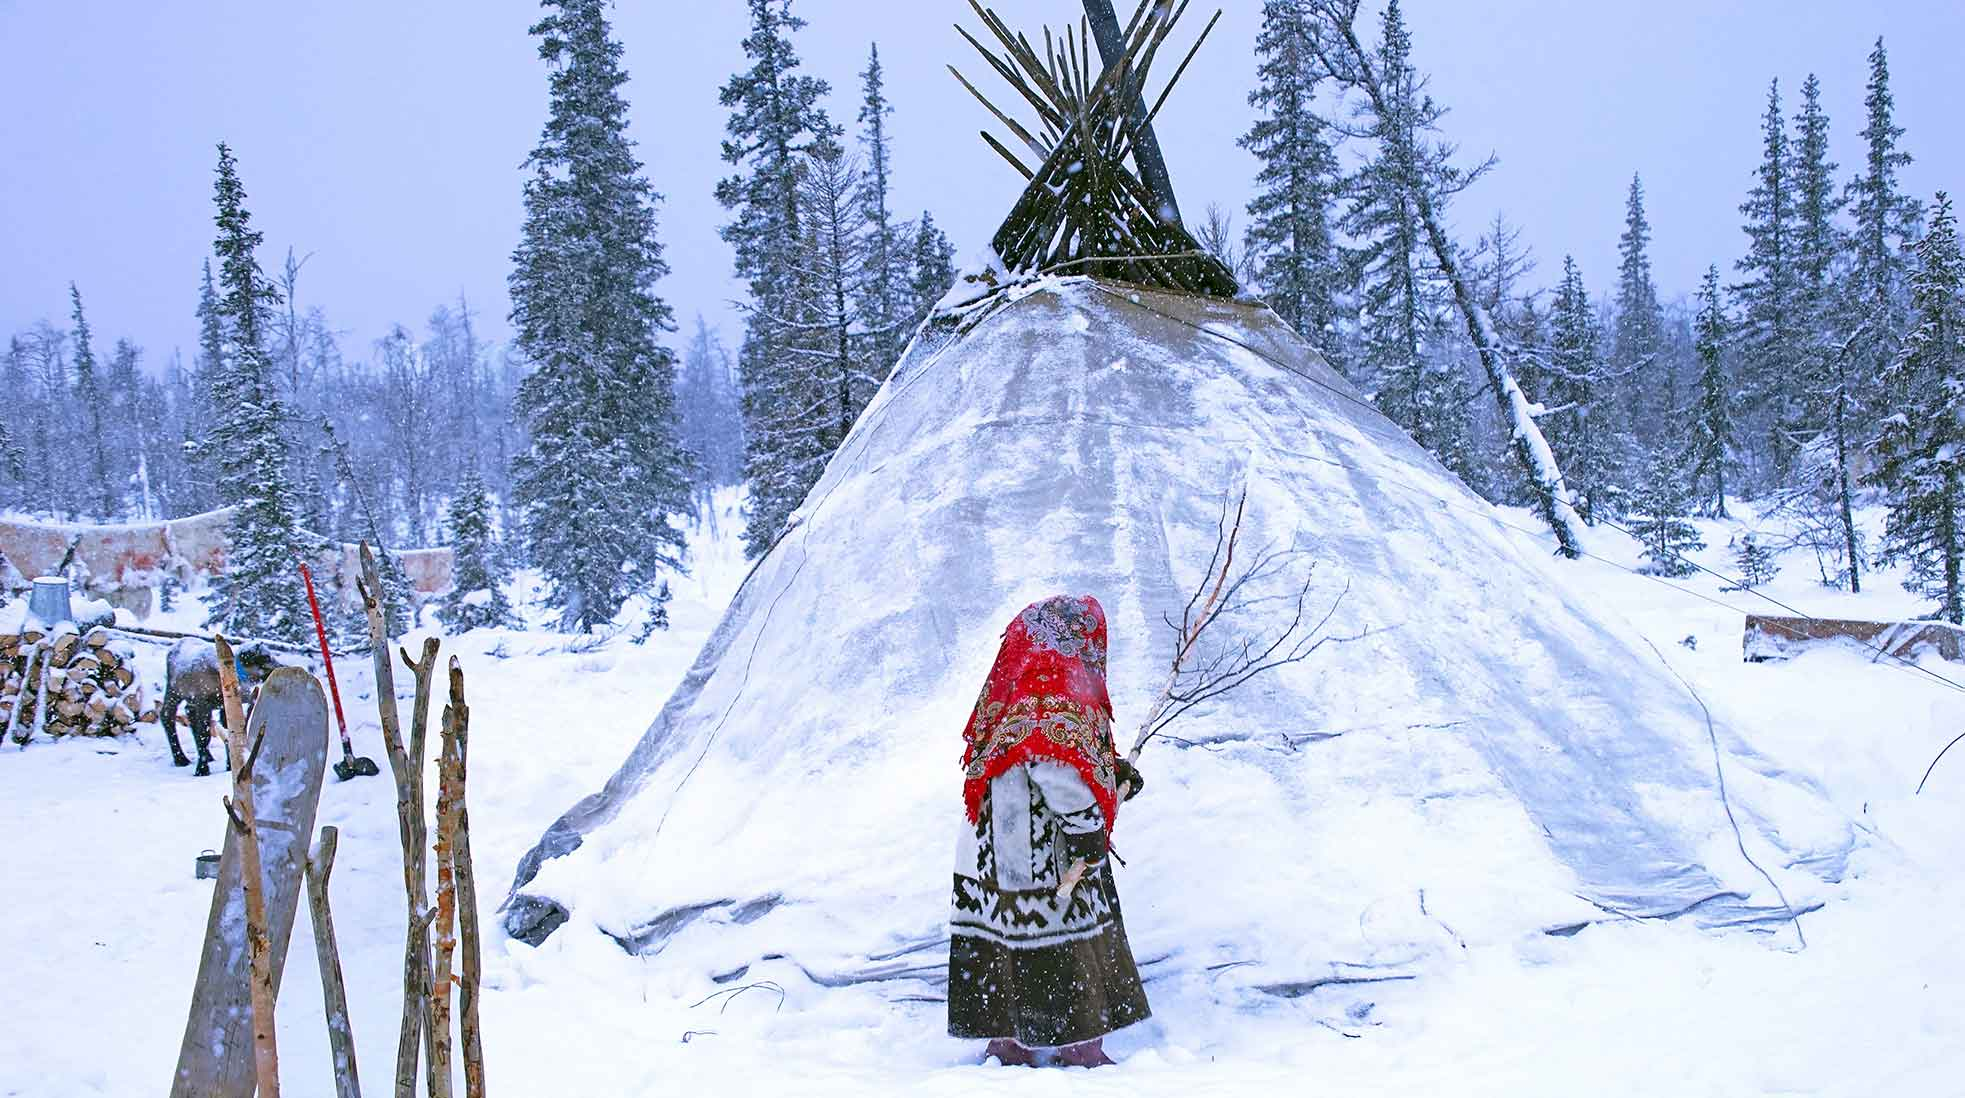 Nenets, Northern Siberia, Russia. Photo: Hans-Jurgen Mager / Unsplash